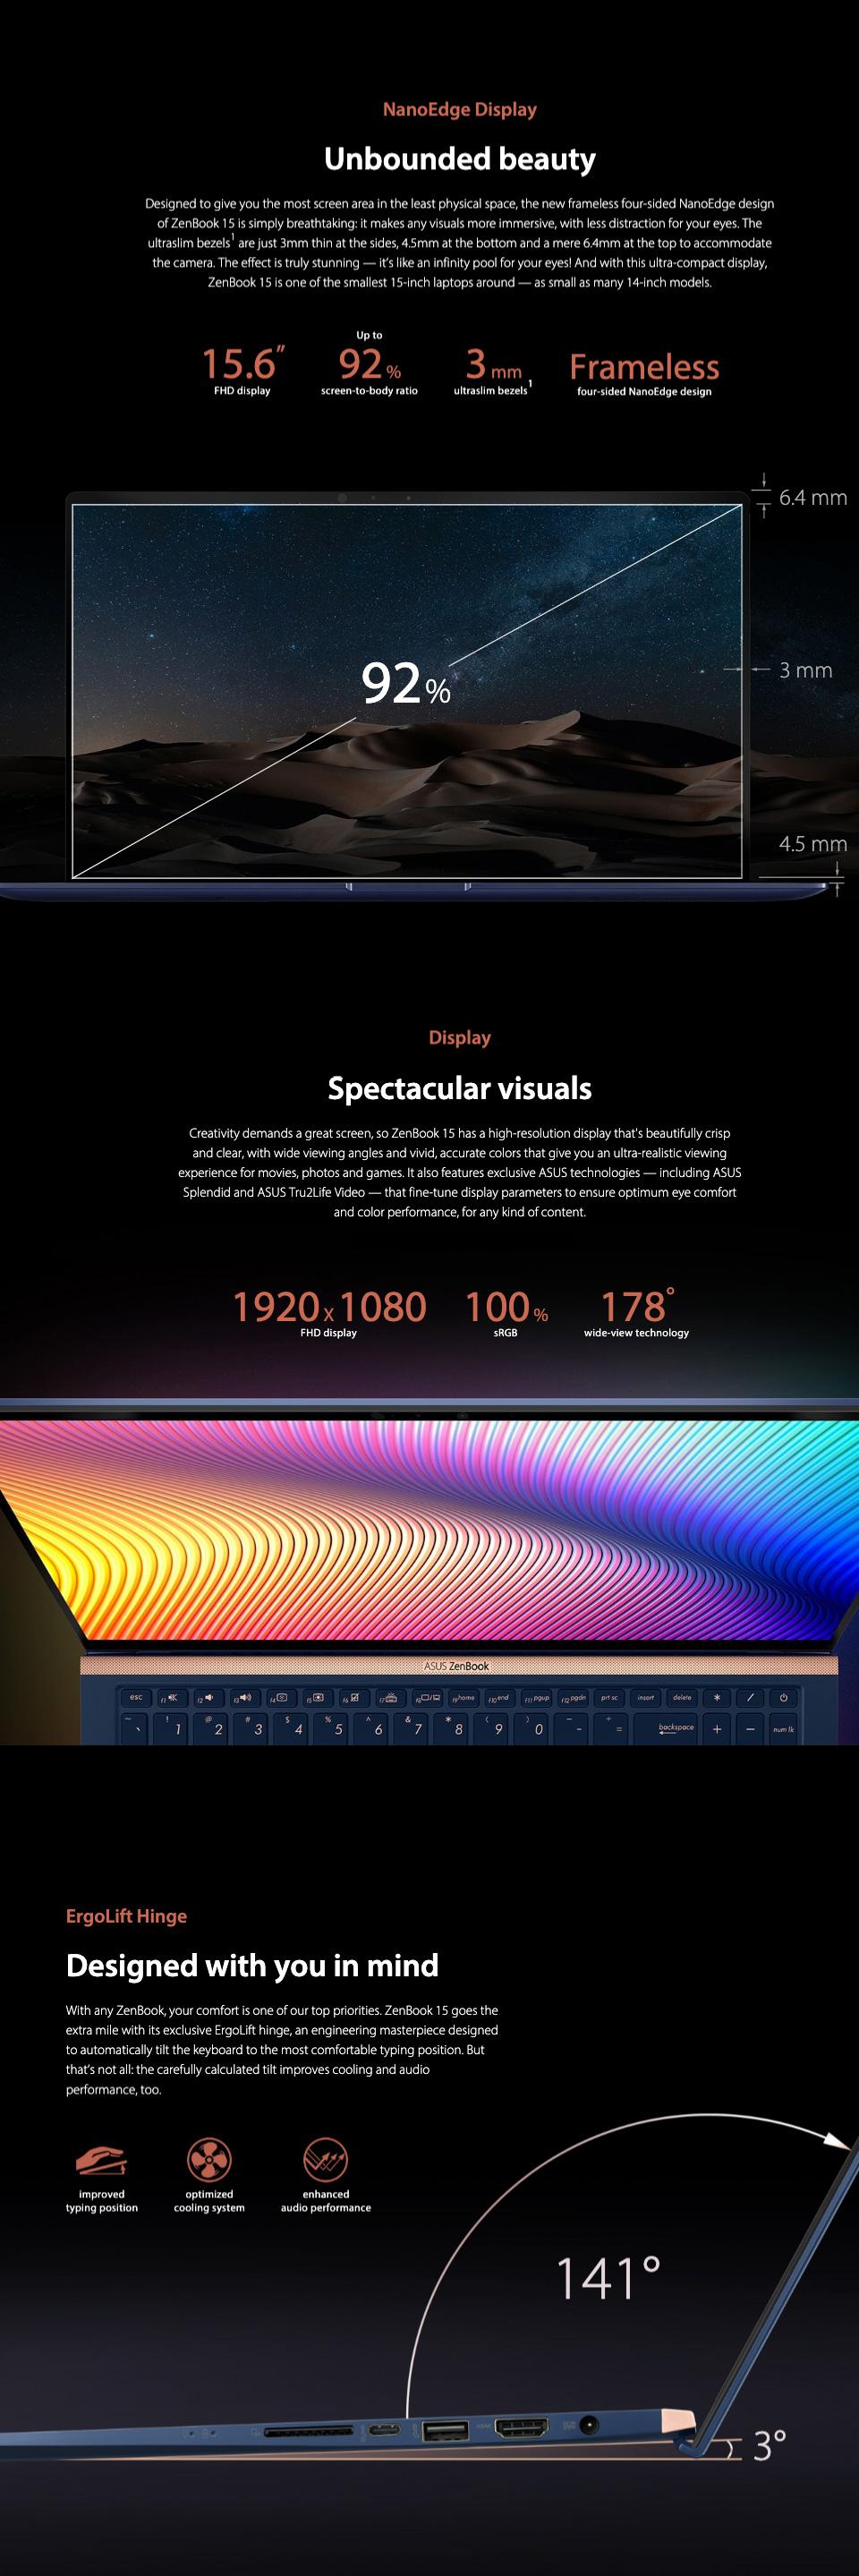 ASUS ZenBook Core i7-8565U GTX 1050 FHD 15.6in Laptop features 2